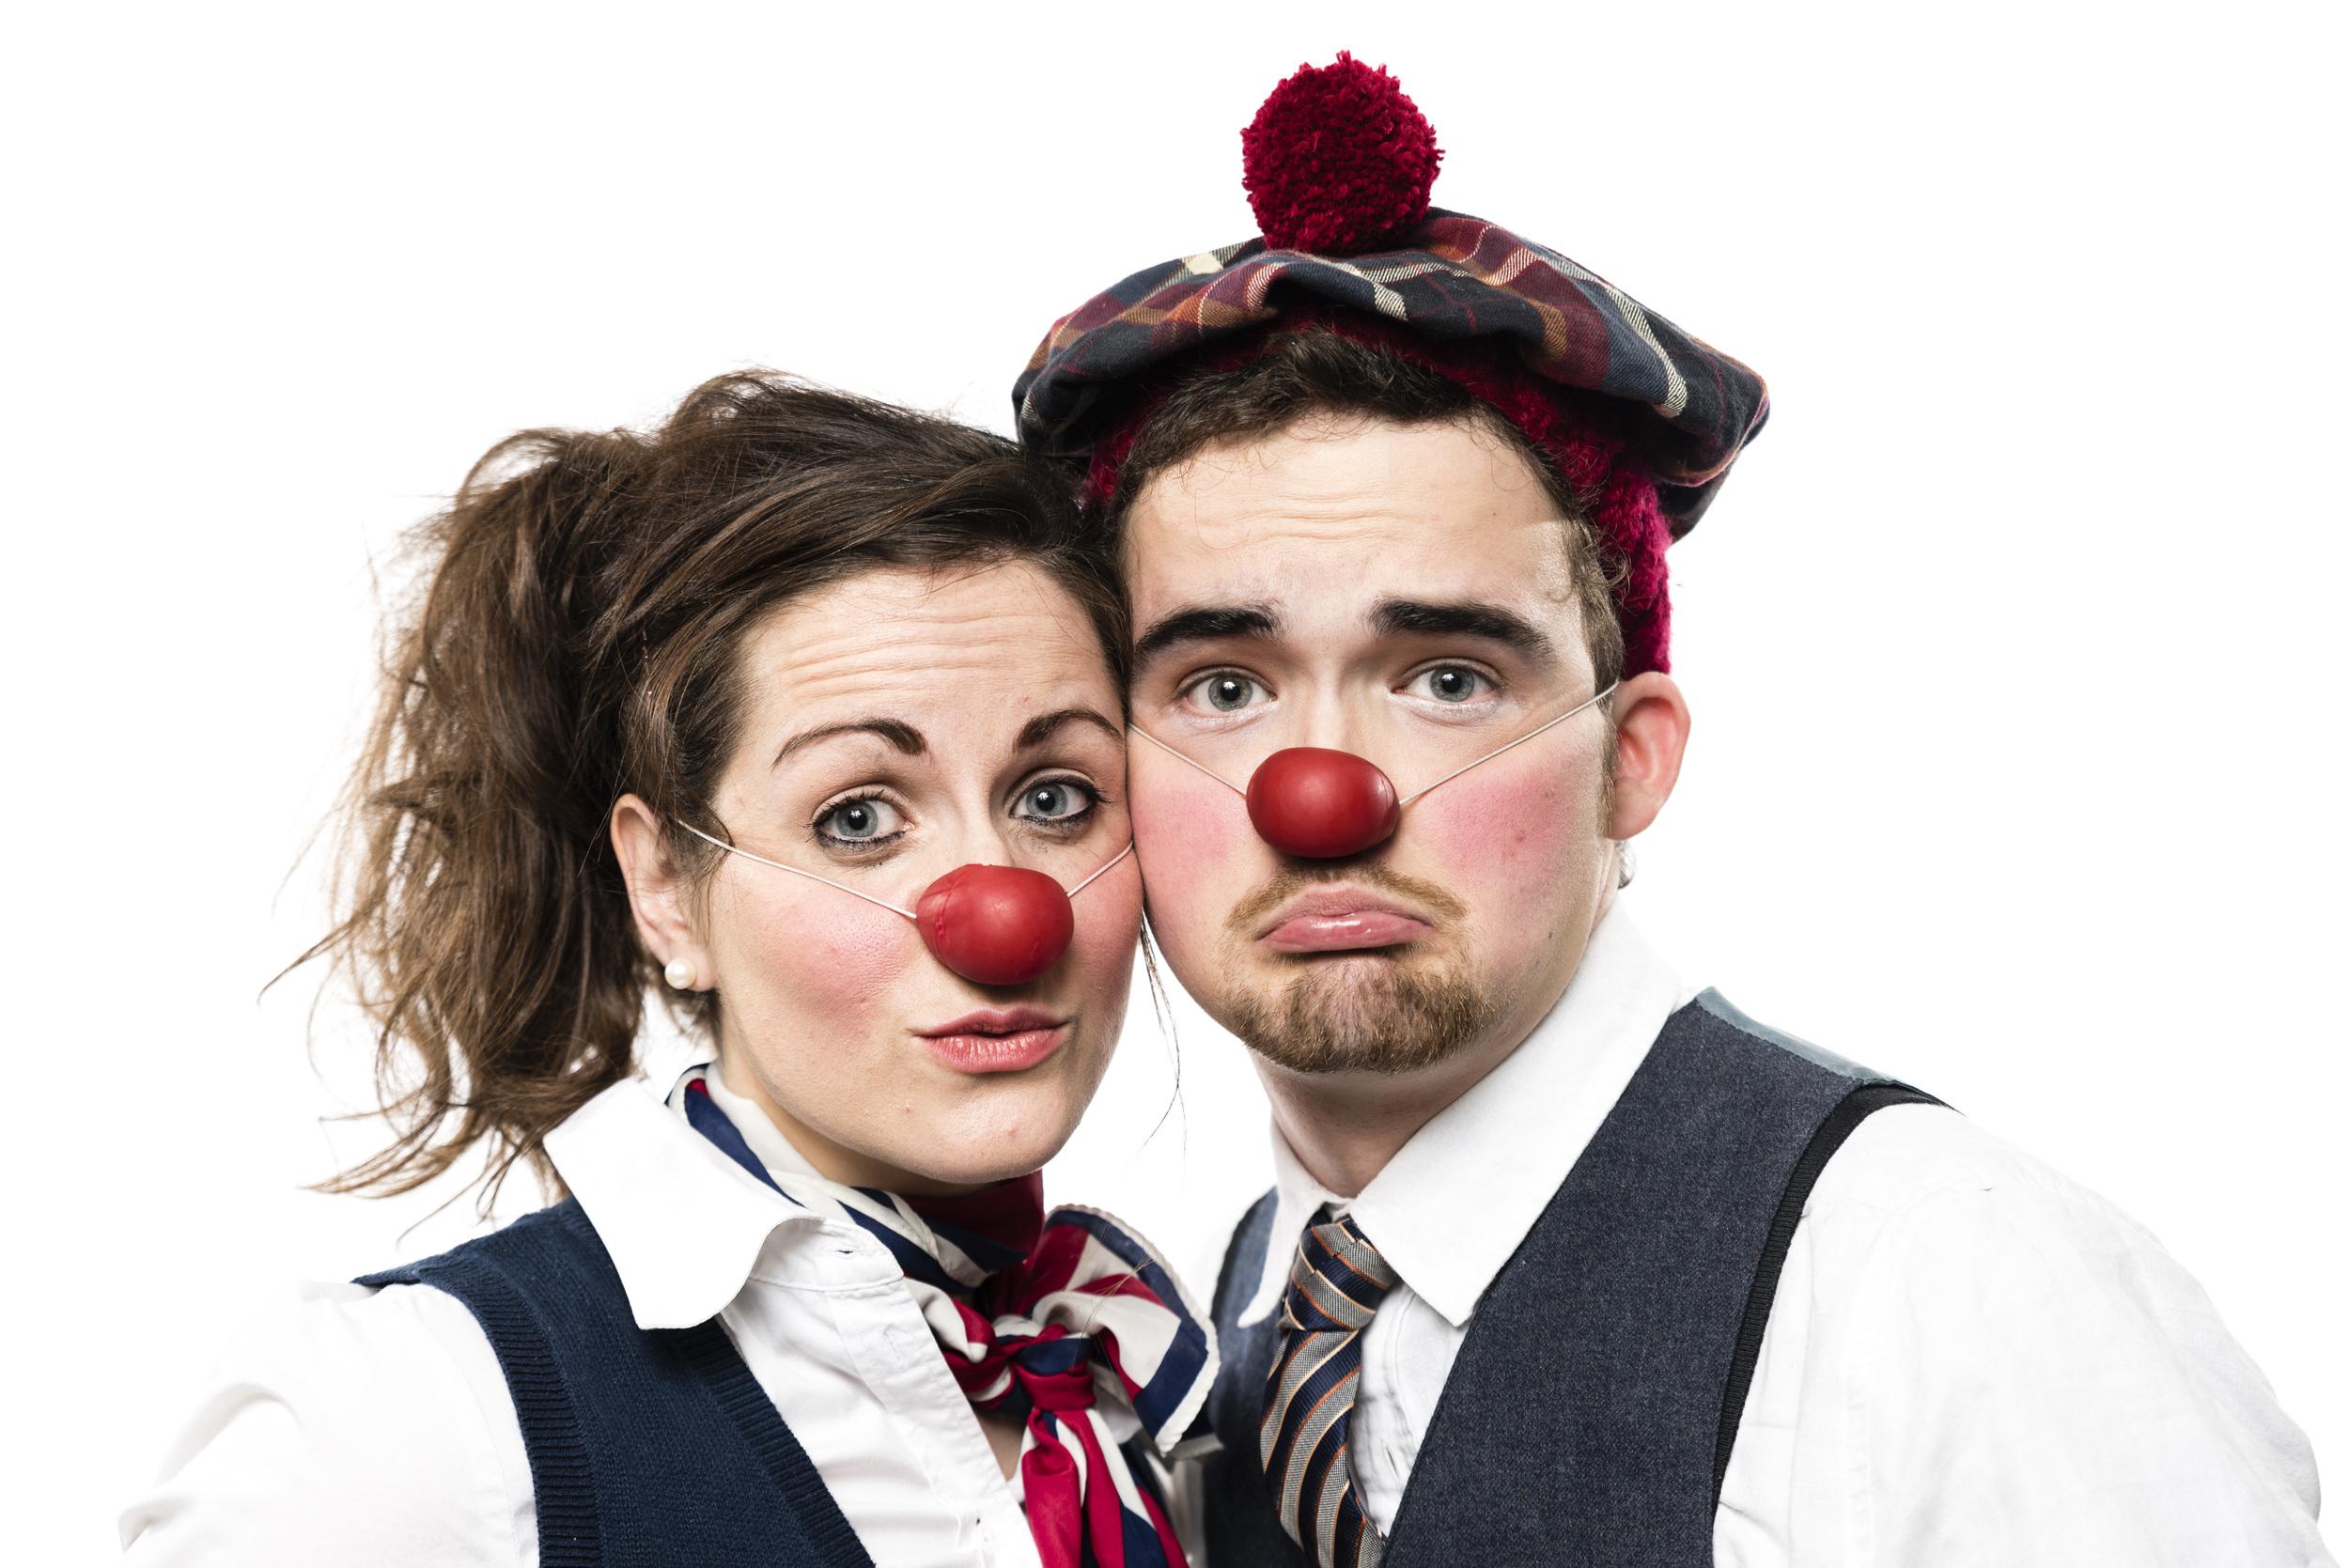 20160122_clowns-041.jpg